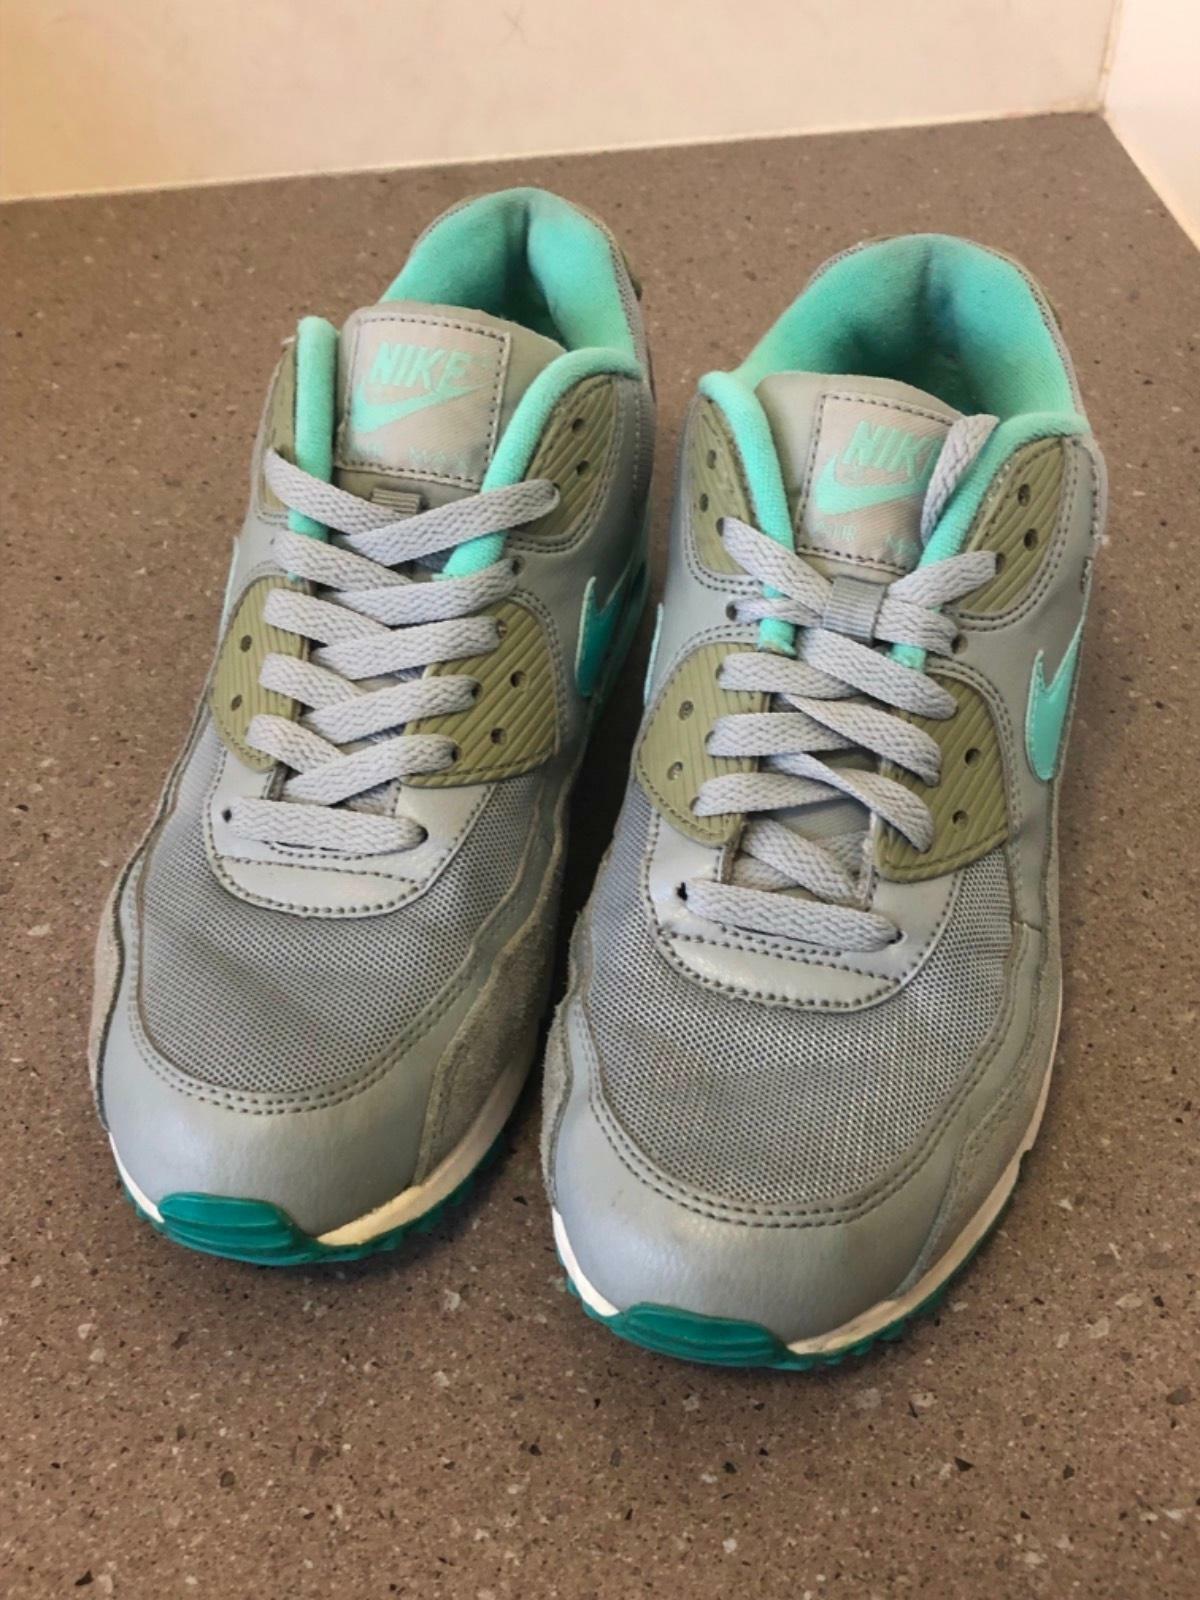 Nike air max 90 donne 8   caratteristica  caratteristica  caratteristica    Scolaro/Signora Scarpa  346c24